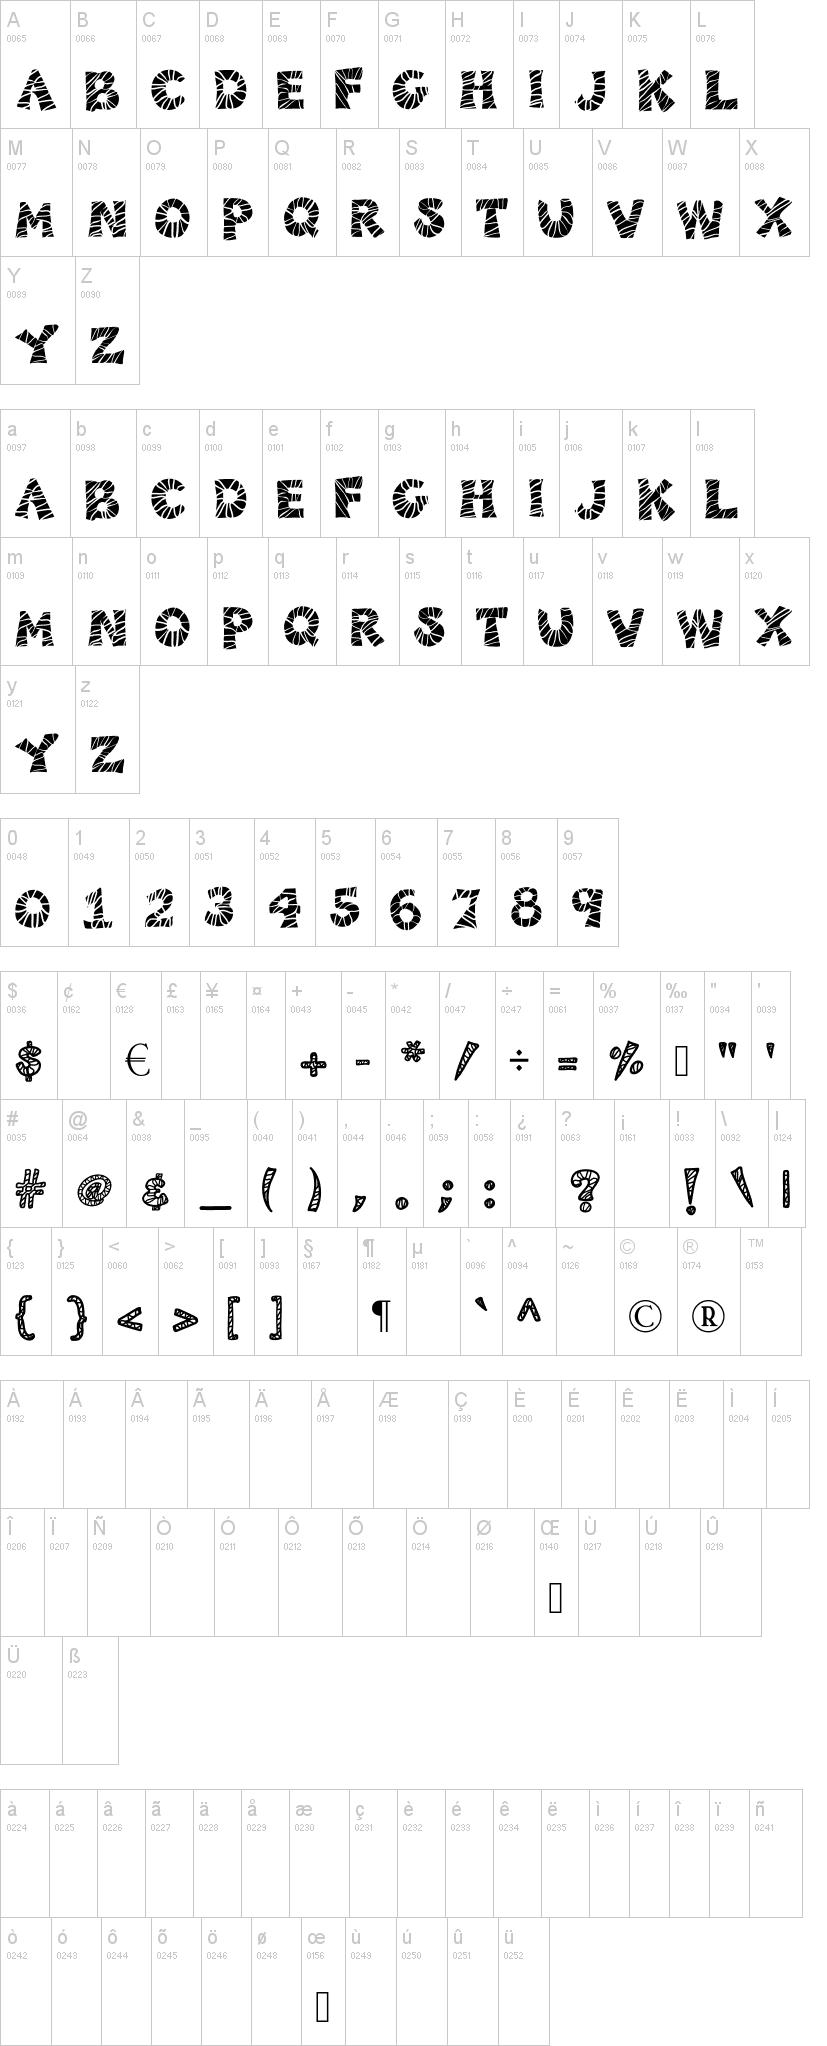 KB3 Zebra Patch Font   dafont.com Zebra 0 Font